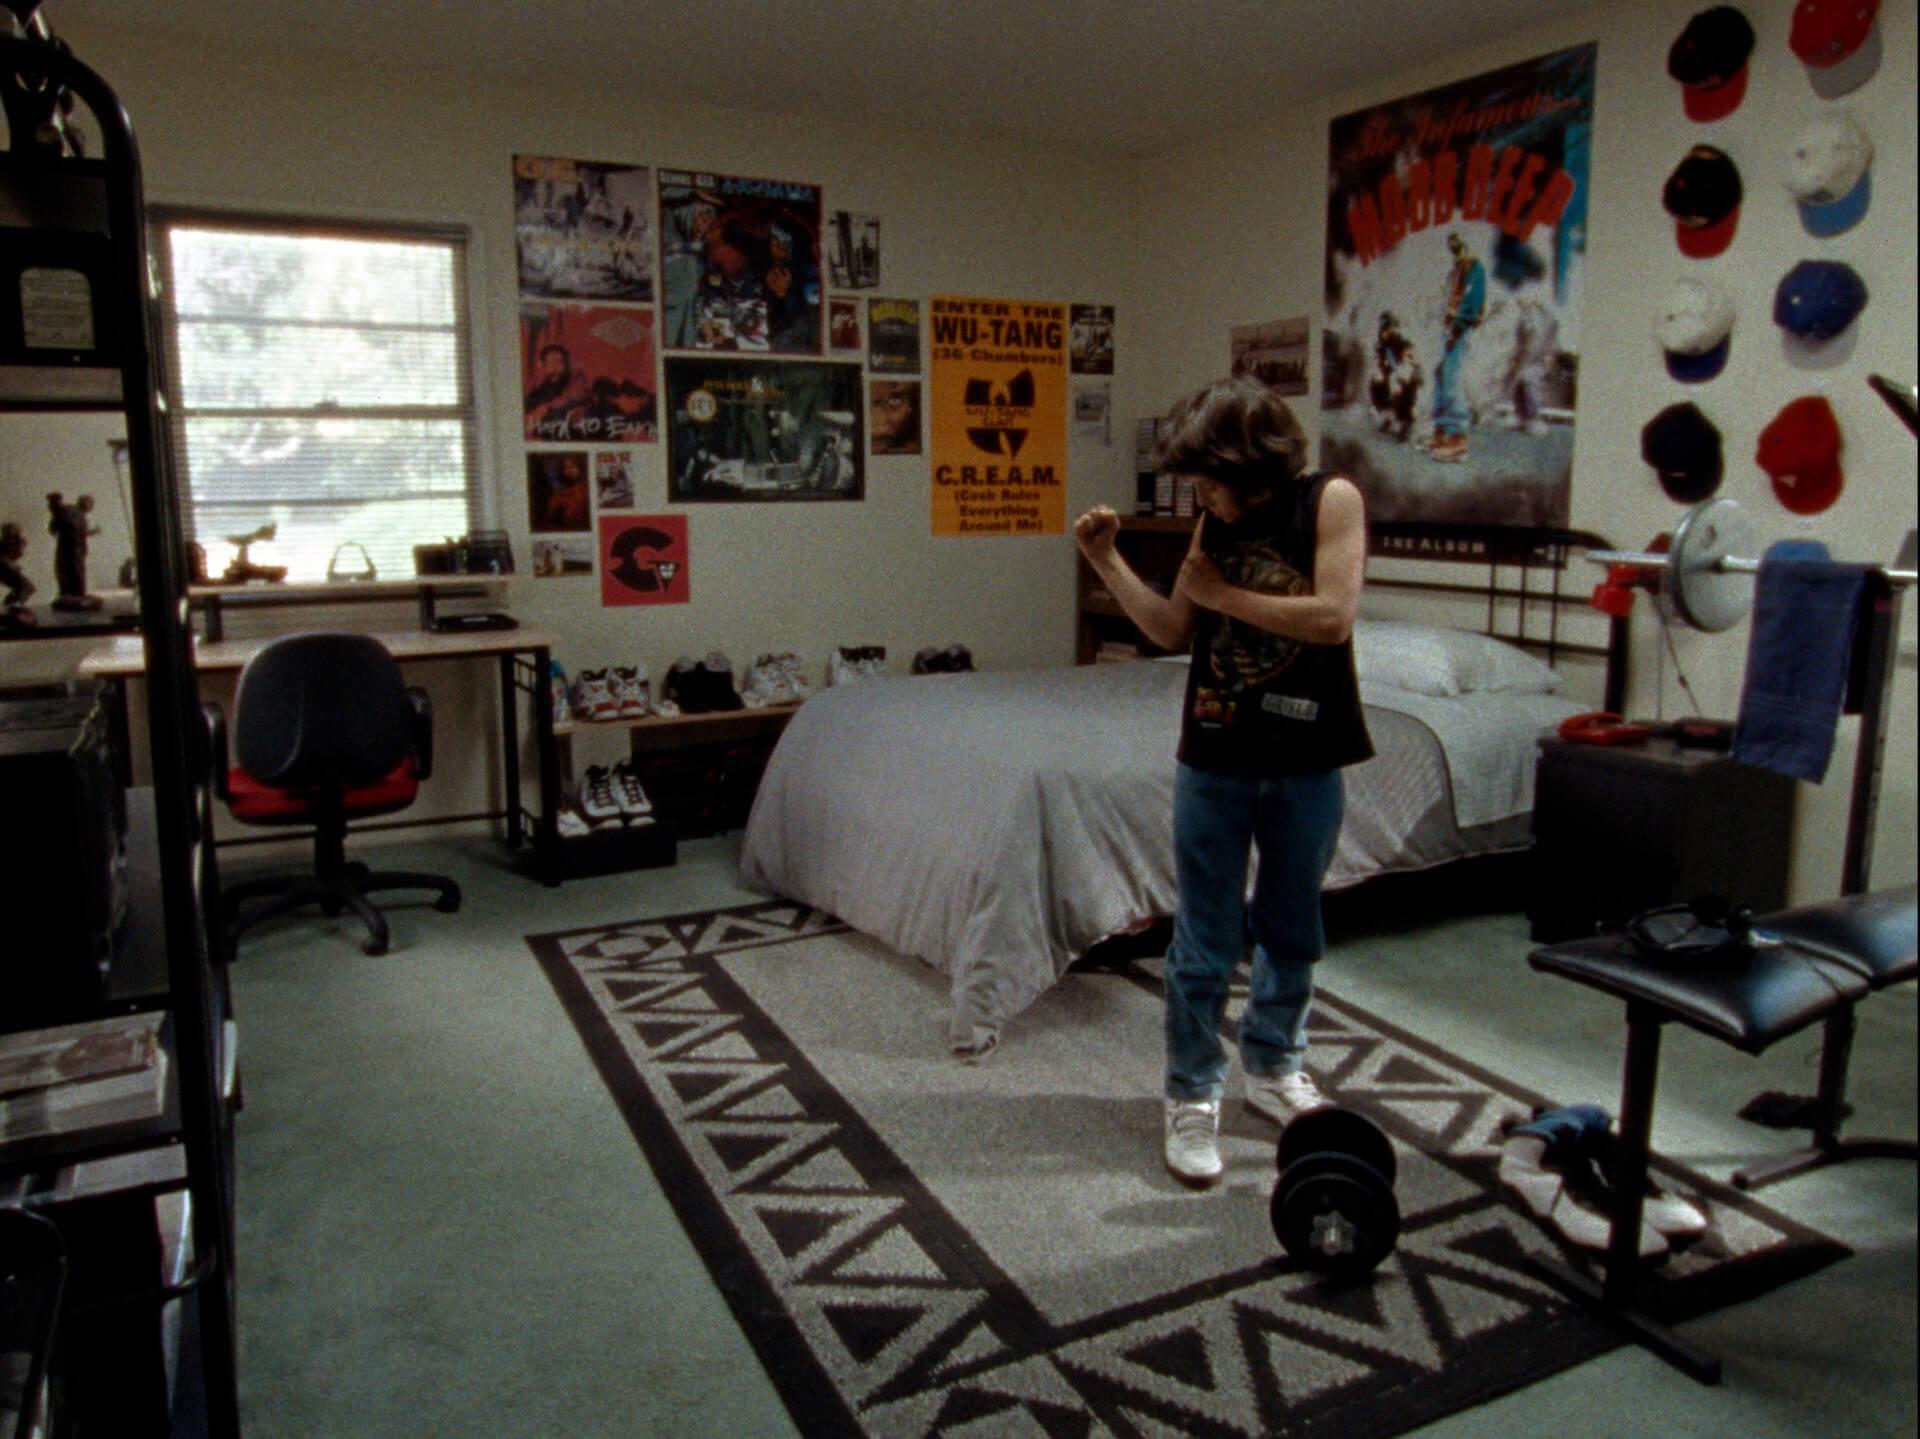 A24最新作『mid90s ミッドナインティーズ』が大ヒットスタートで拡大公開決定!ジョナ・ヒル監督が映画への想いを語った特別メイキング映像も公開 film200904_mid90s_2